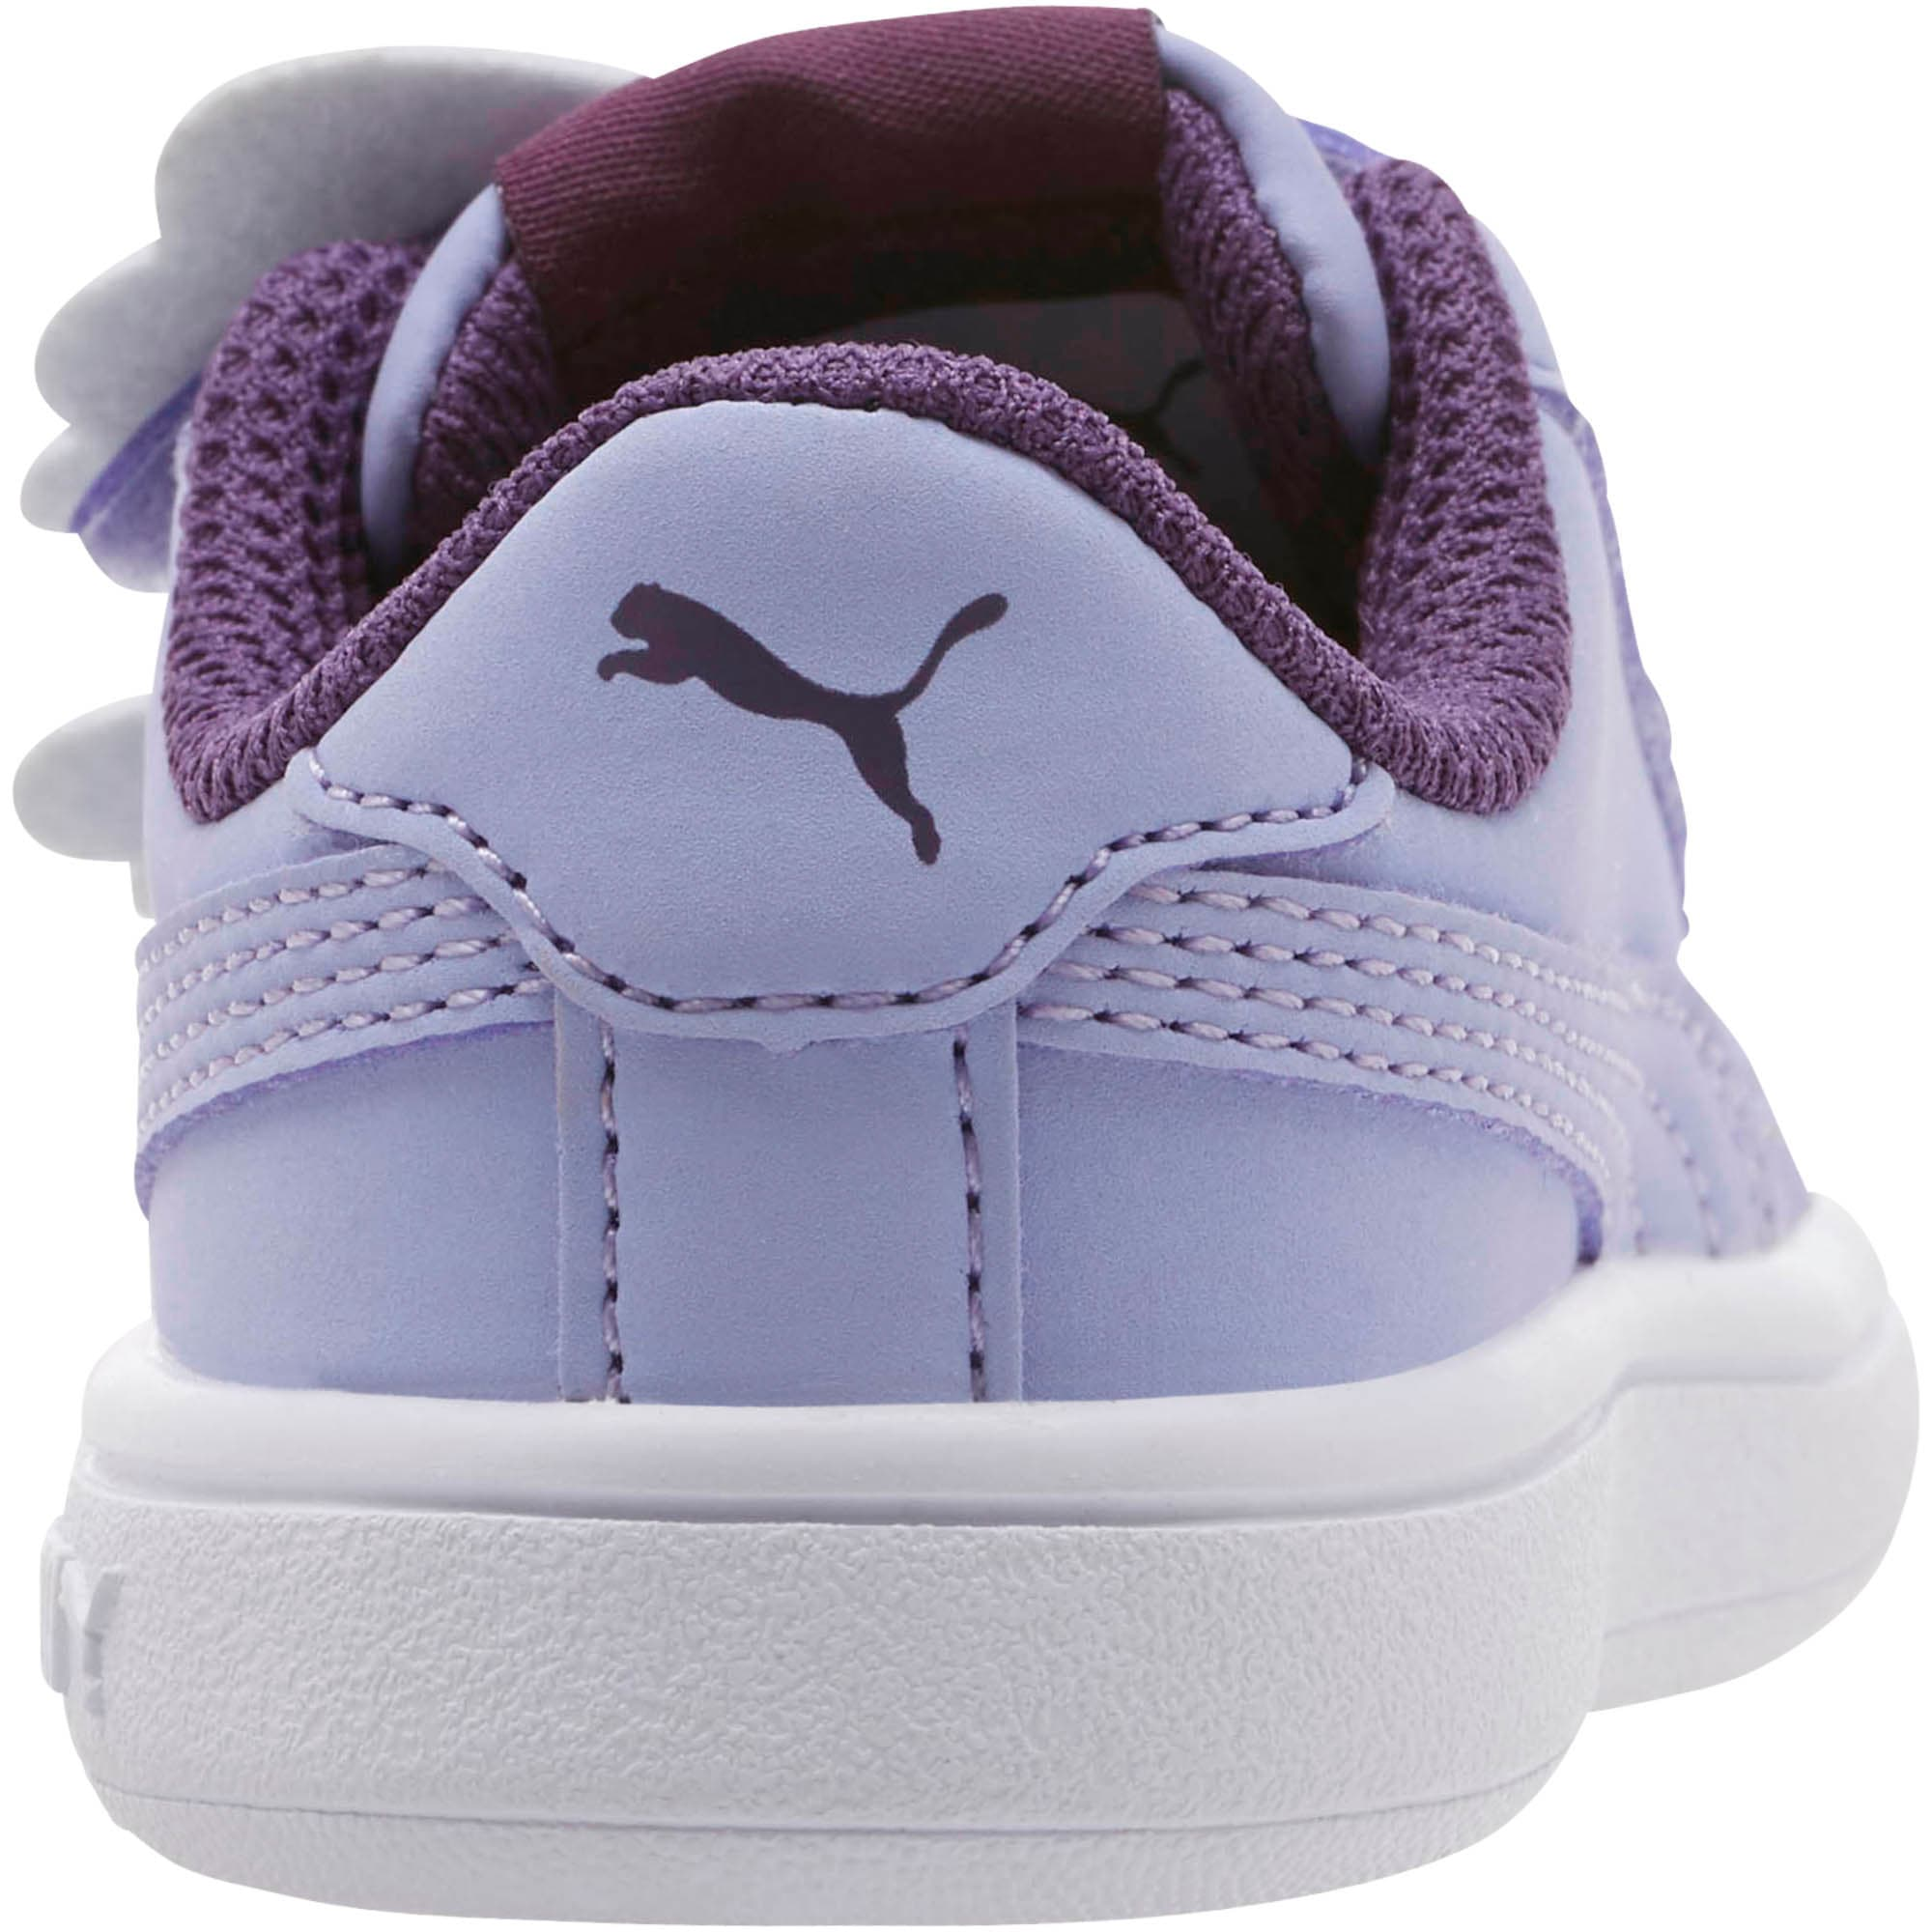 Thumbnail 3 of PUMA Smash v2 Butterfly AC Toddler Shoes, Sweet Lavender-Indigo-White, medium